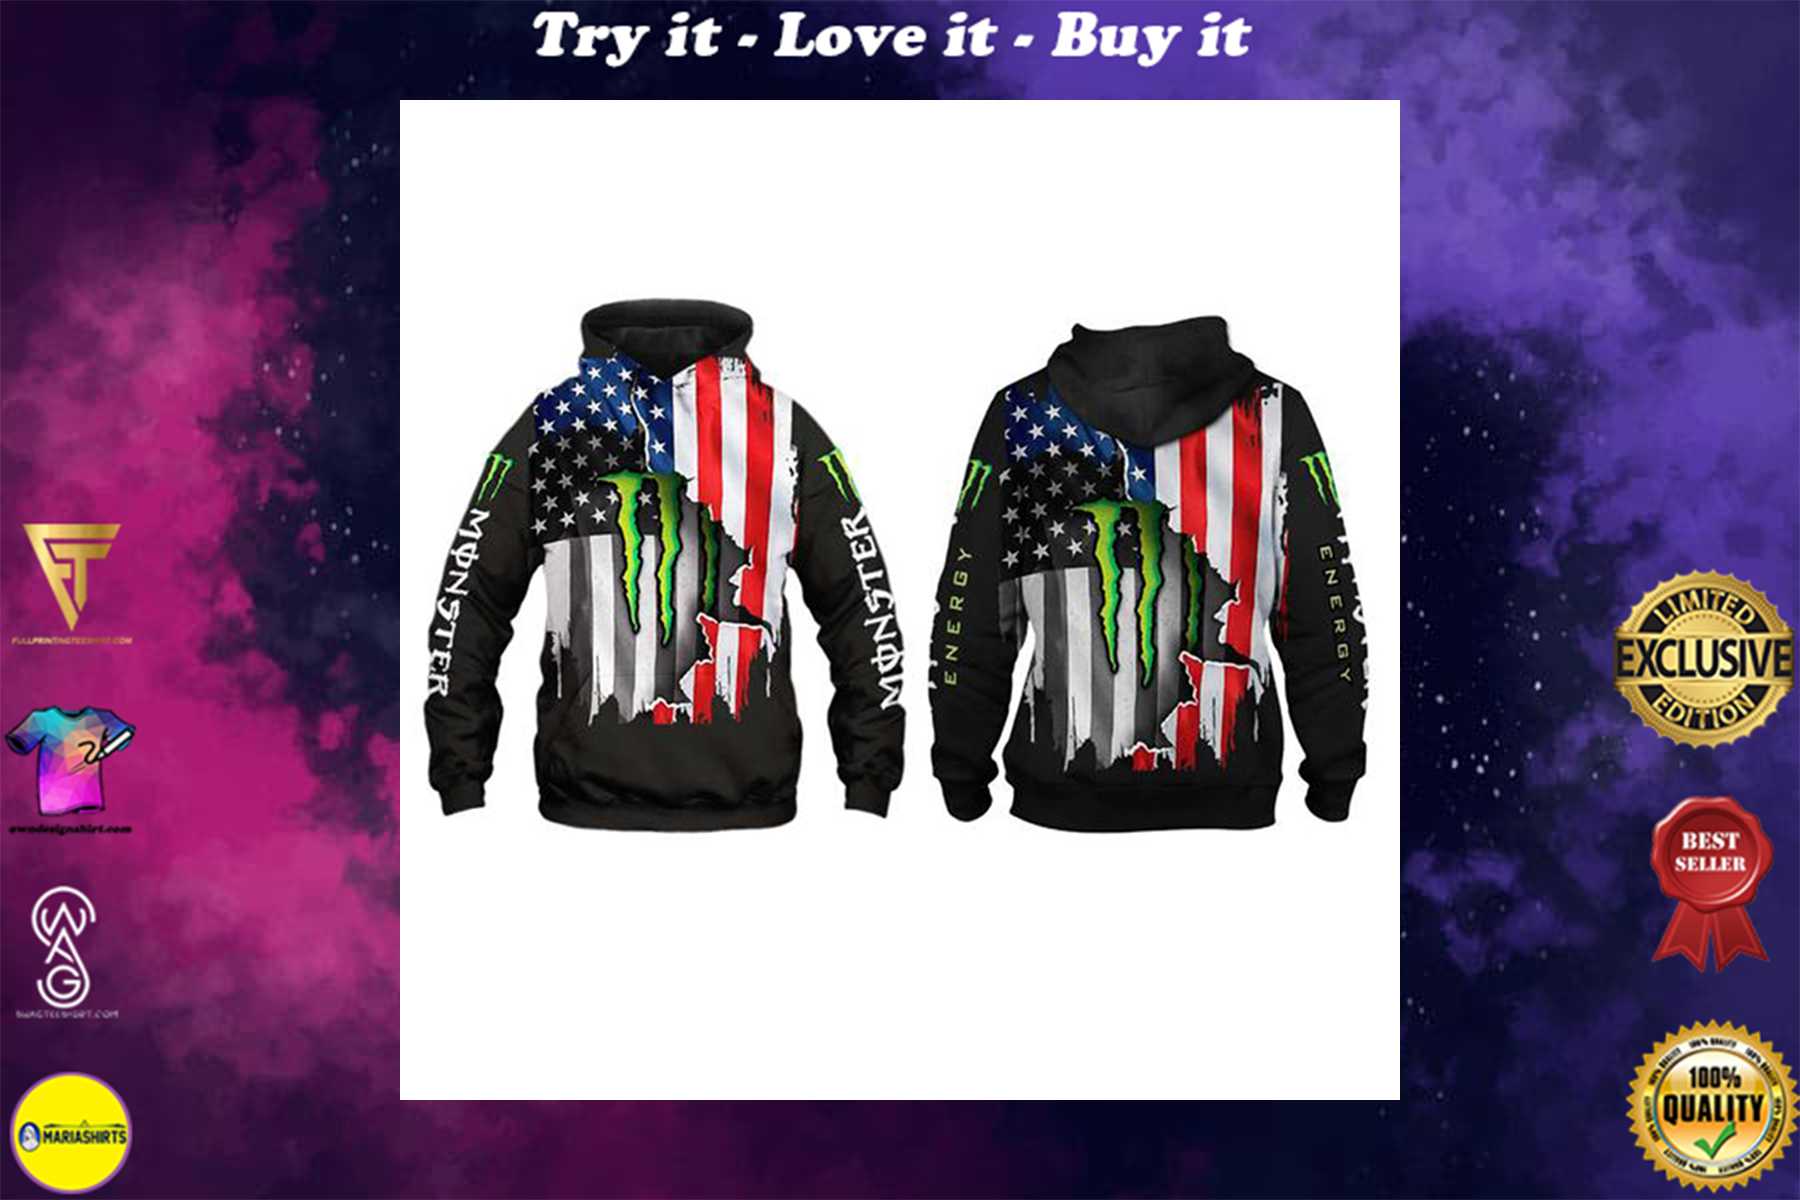 [special edition] american flag monster energy team motocross full printing shirt - maria